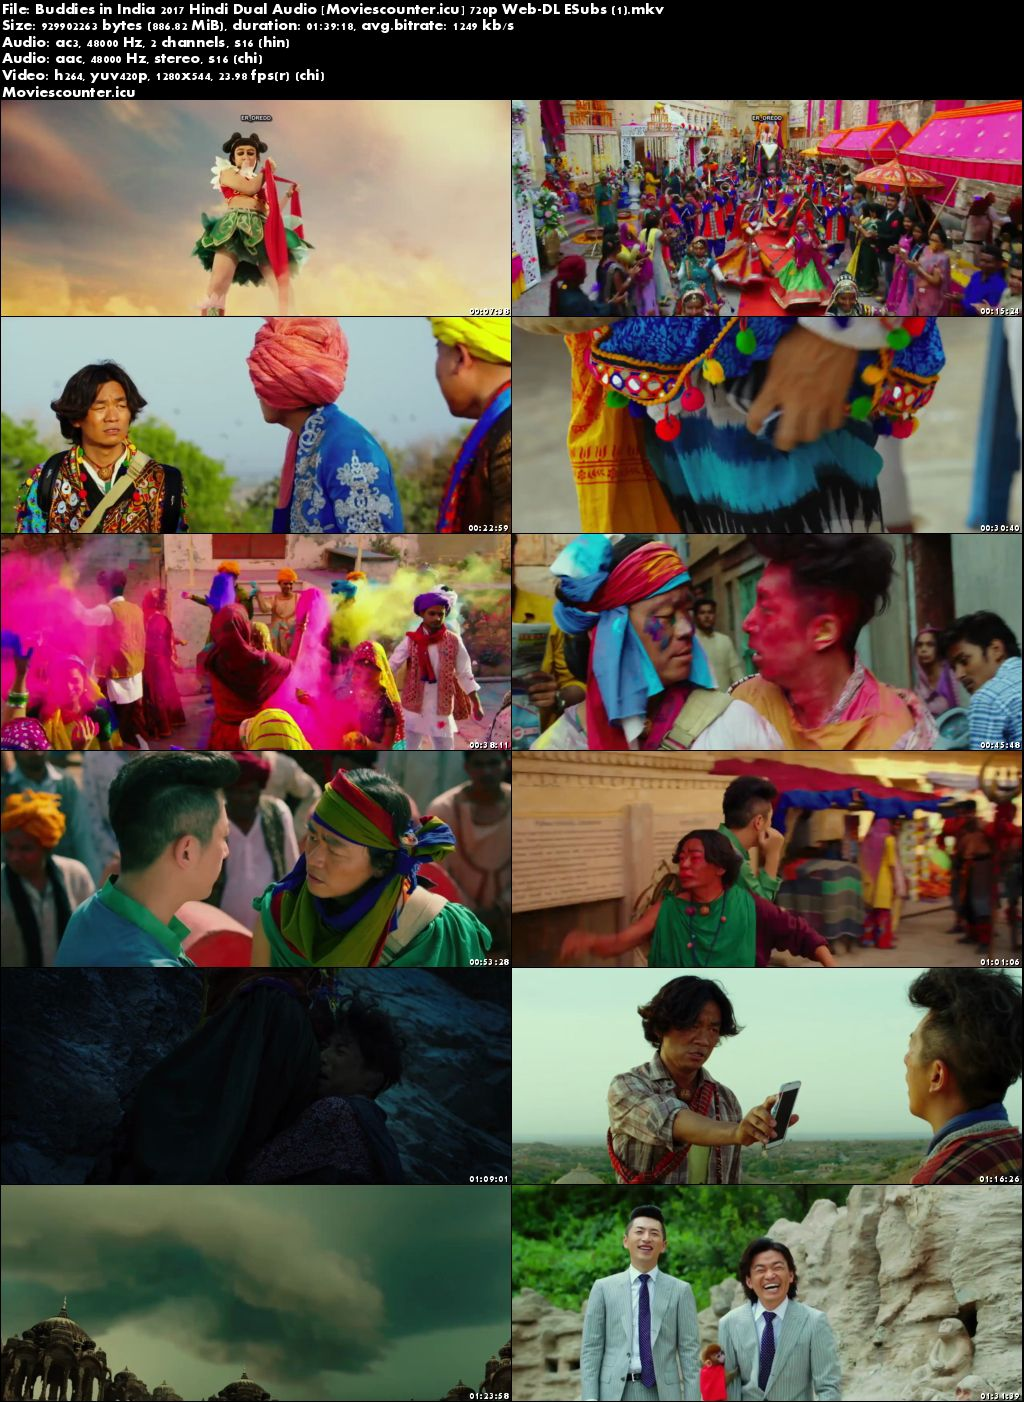 Screen Shots Buddies in India 2017 Dual Audio HD 720p